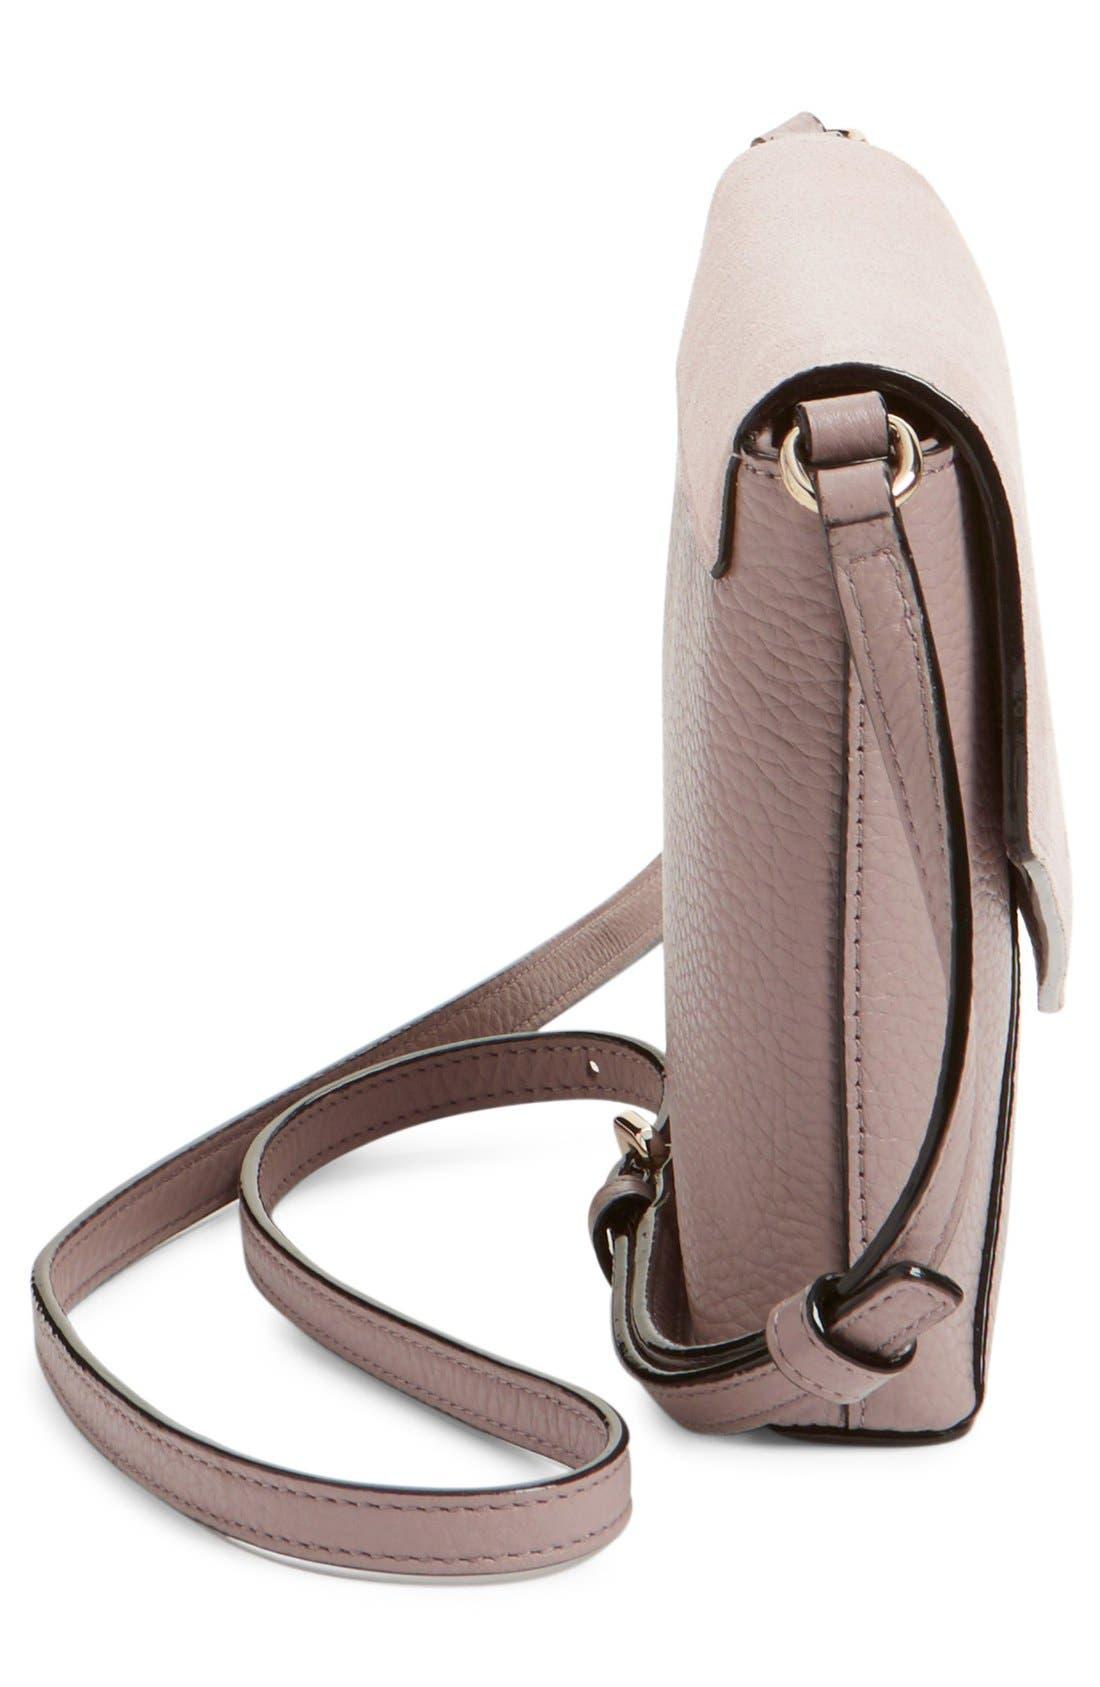 Alternate Image 5  - kate spade new york 'spencer court - large monday' suede & leather envelope crossbody bag (Nordstrom Exclusive)